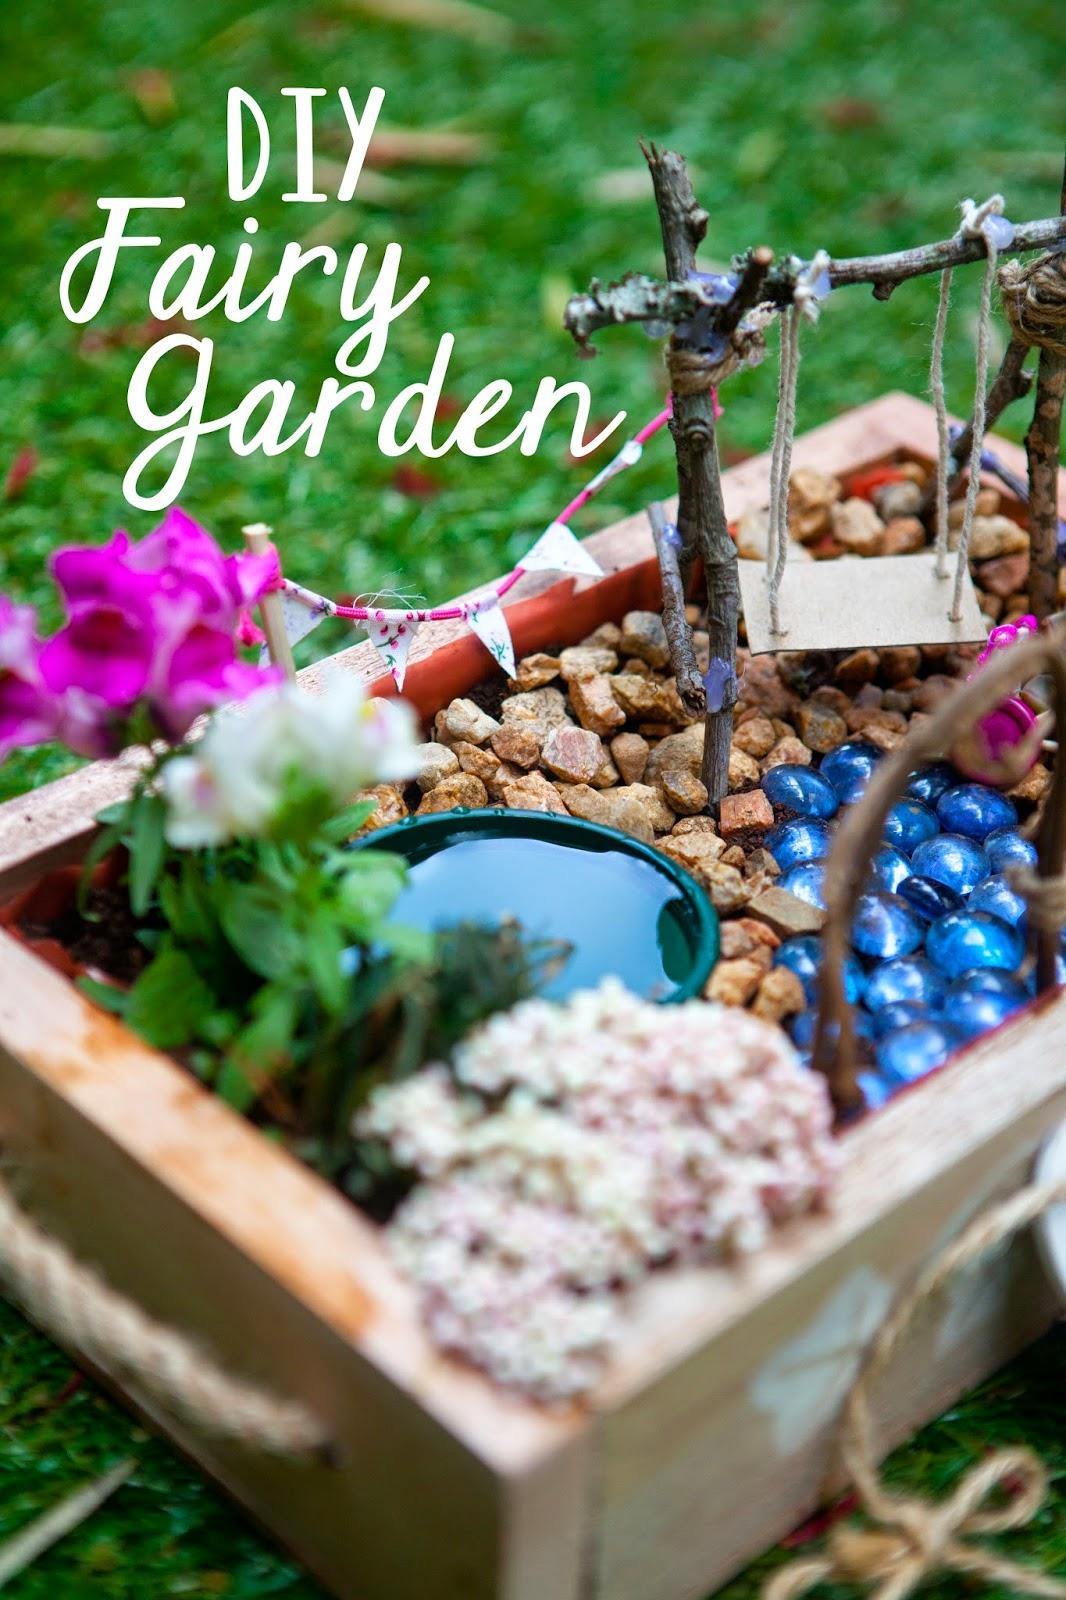 Floral Philosopher DIY Fairy Garden in a Box